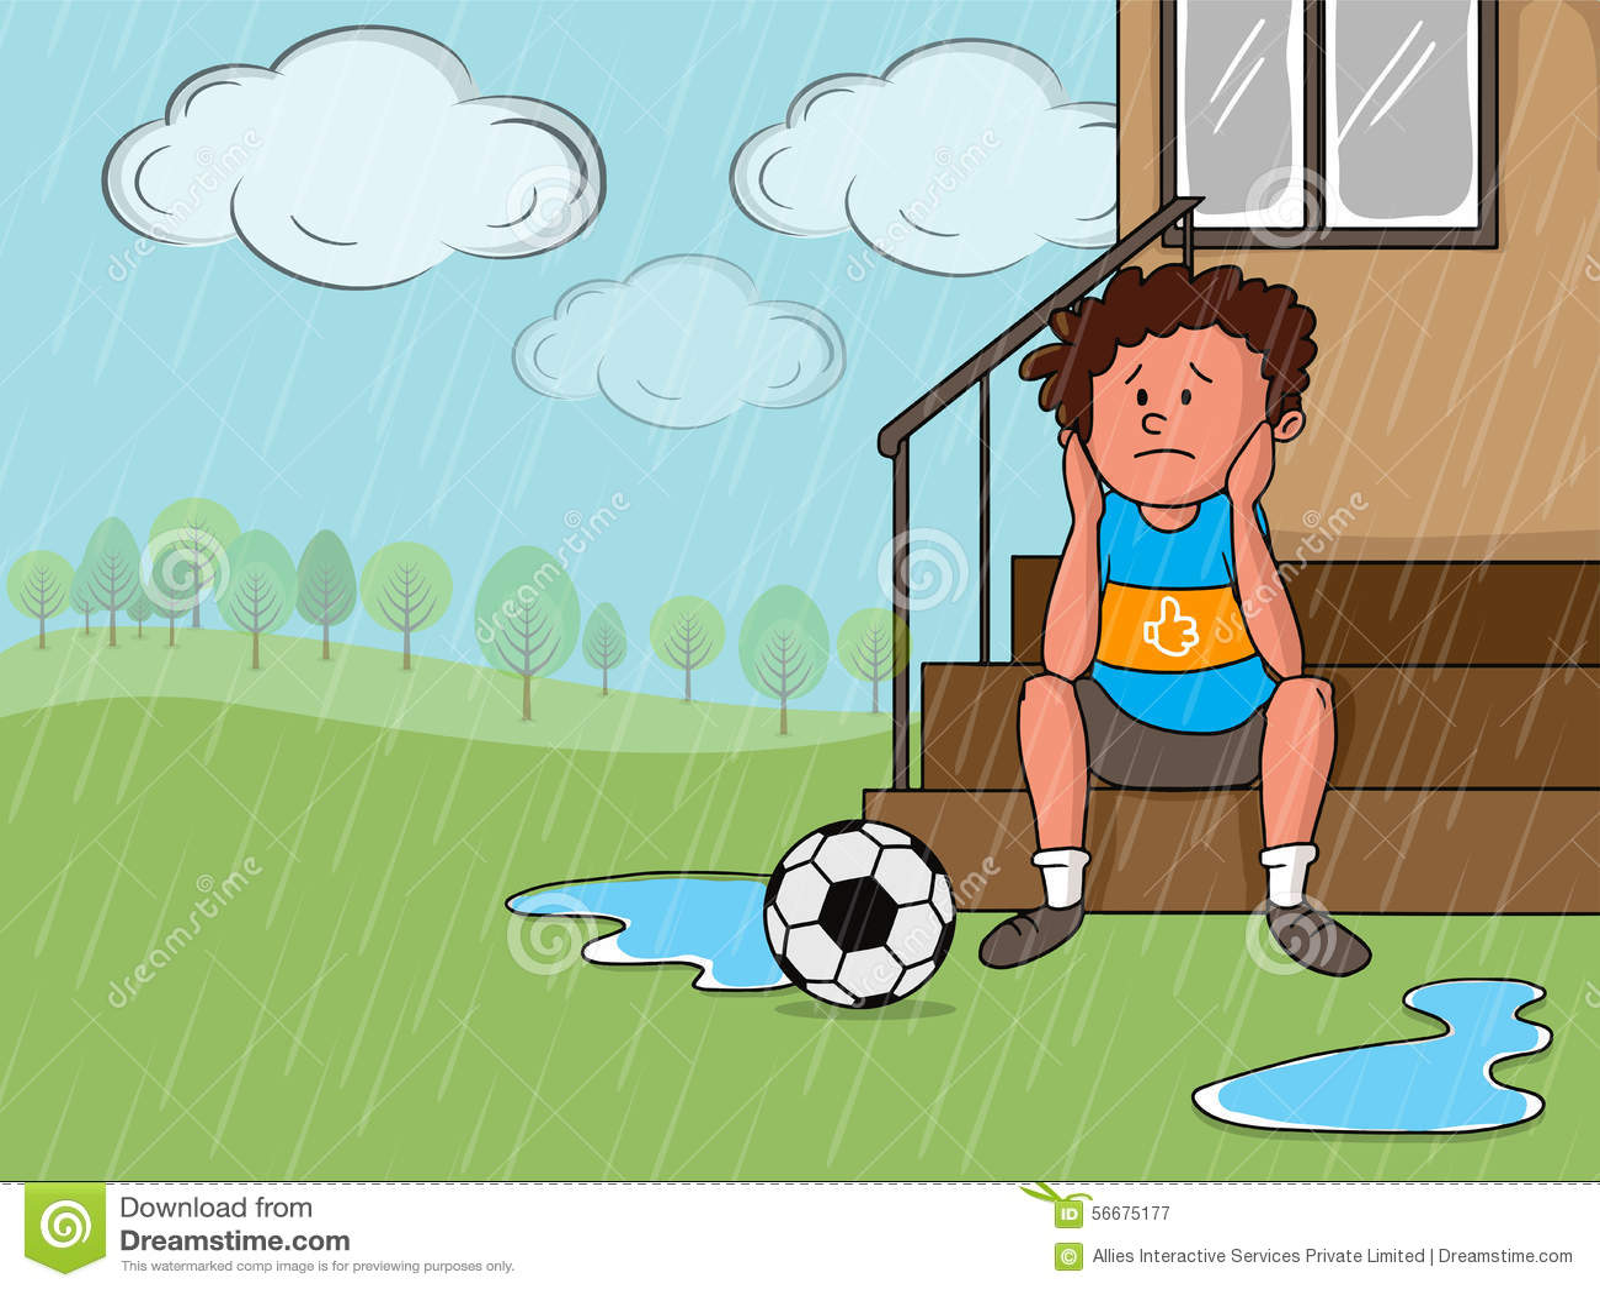 Rainy Day Concept With Sad Boy. Stock Illustration